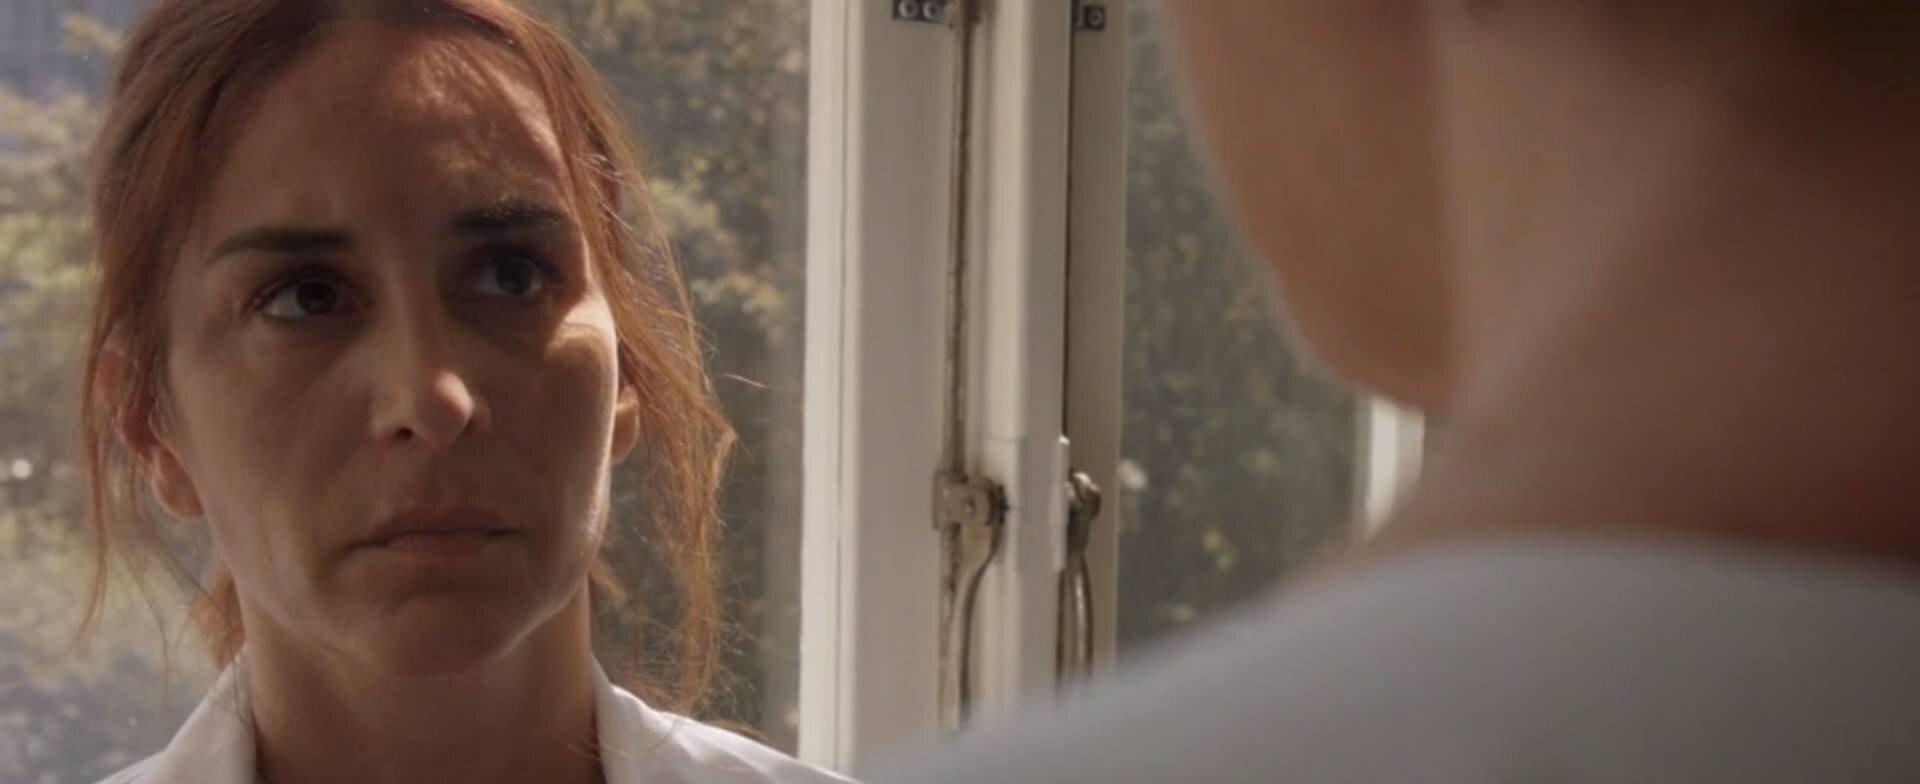 "Actor Alexandra Rapaport (Helena) on set of the pilot for ""Eggs, Flour and Sugar"". Tiny Lumberjack copyright."